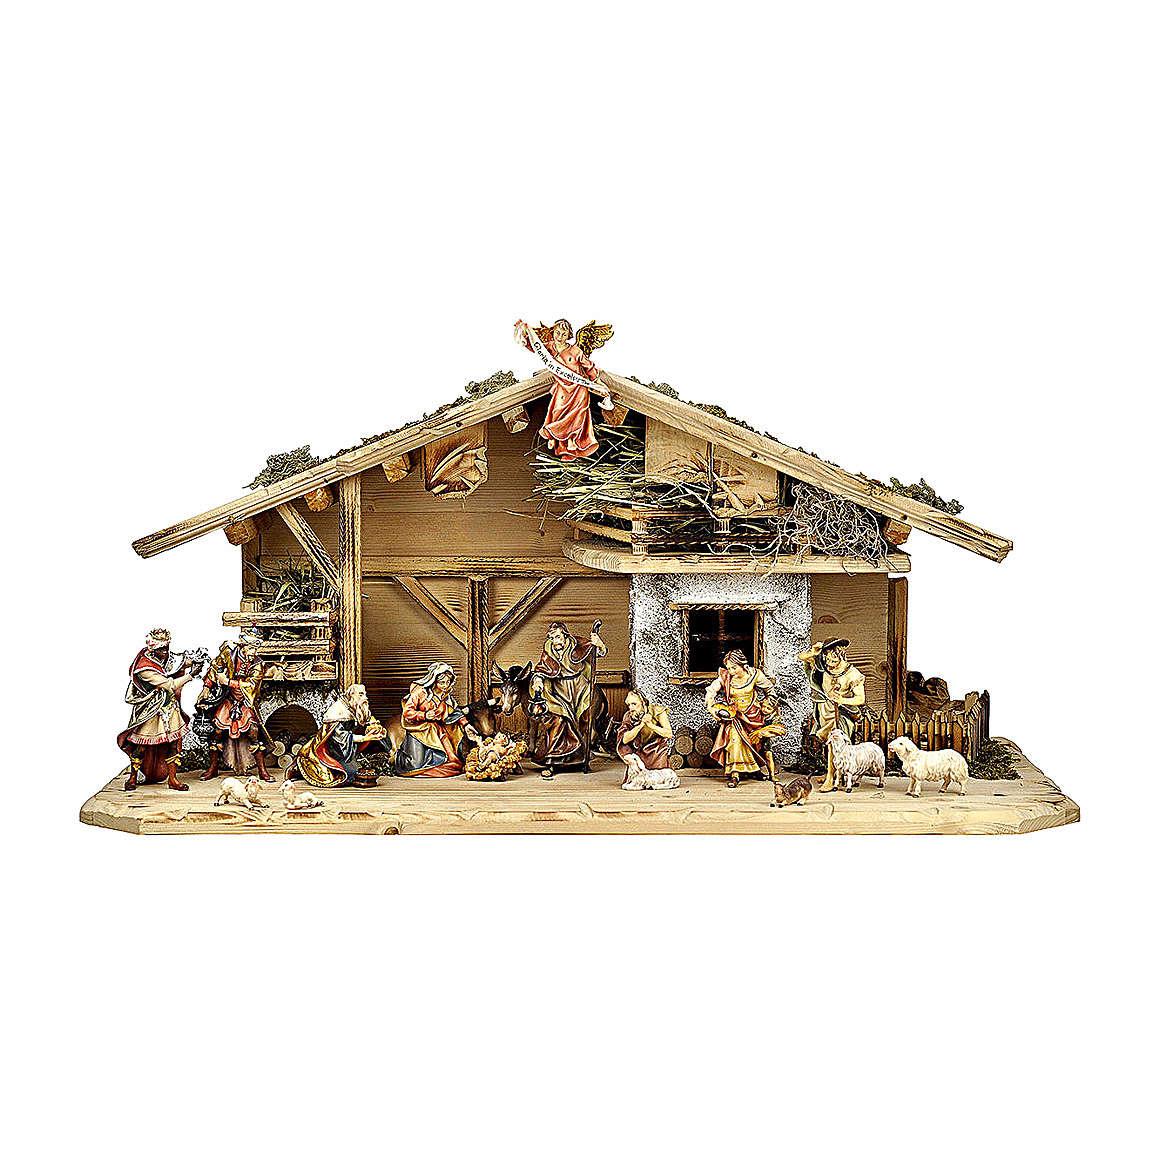 Presepe re magi, pastori, bue e asino mod. Original legno dipinto Val Gardena 12 cm - 18 pz 4